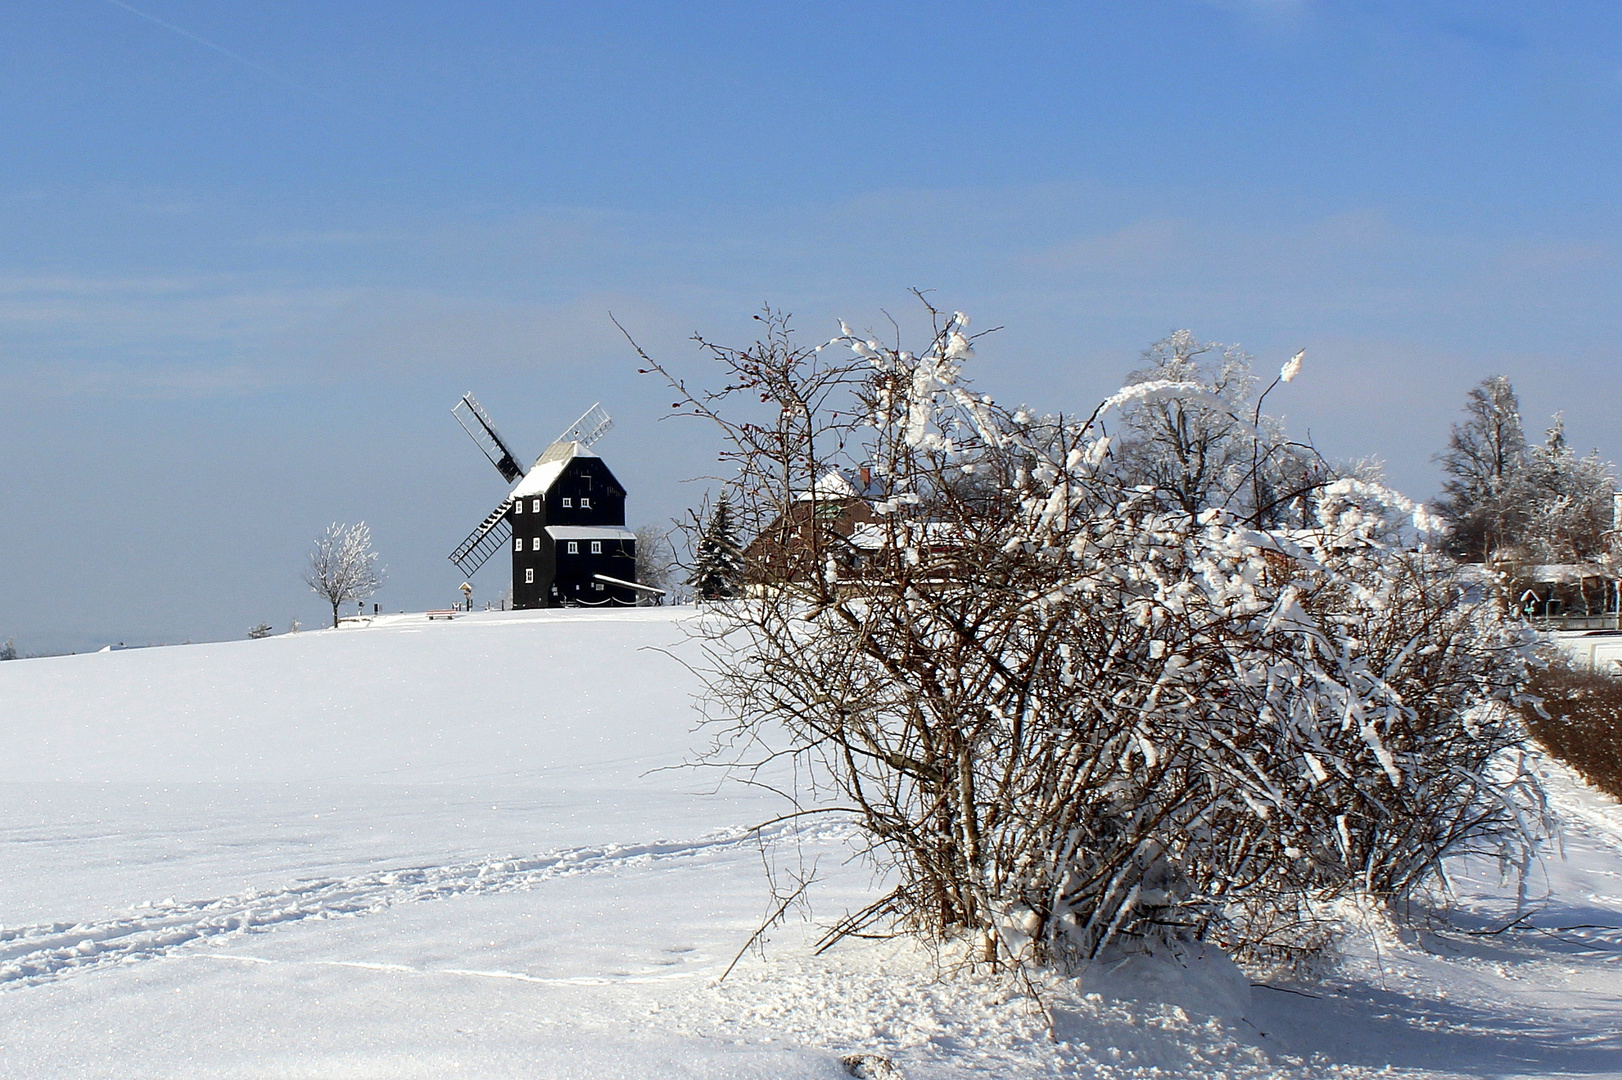 Winter an der Bockwindmühle in Kottmarsdorf